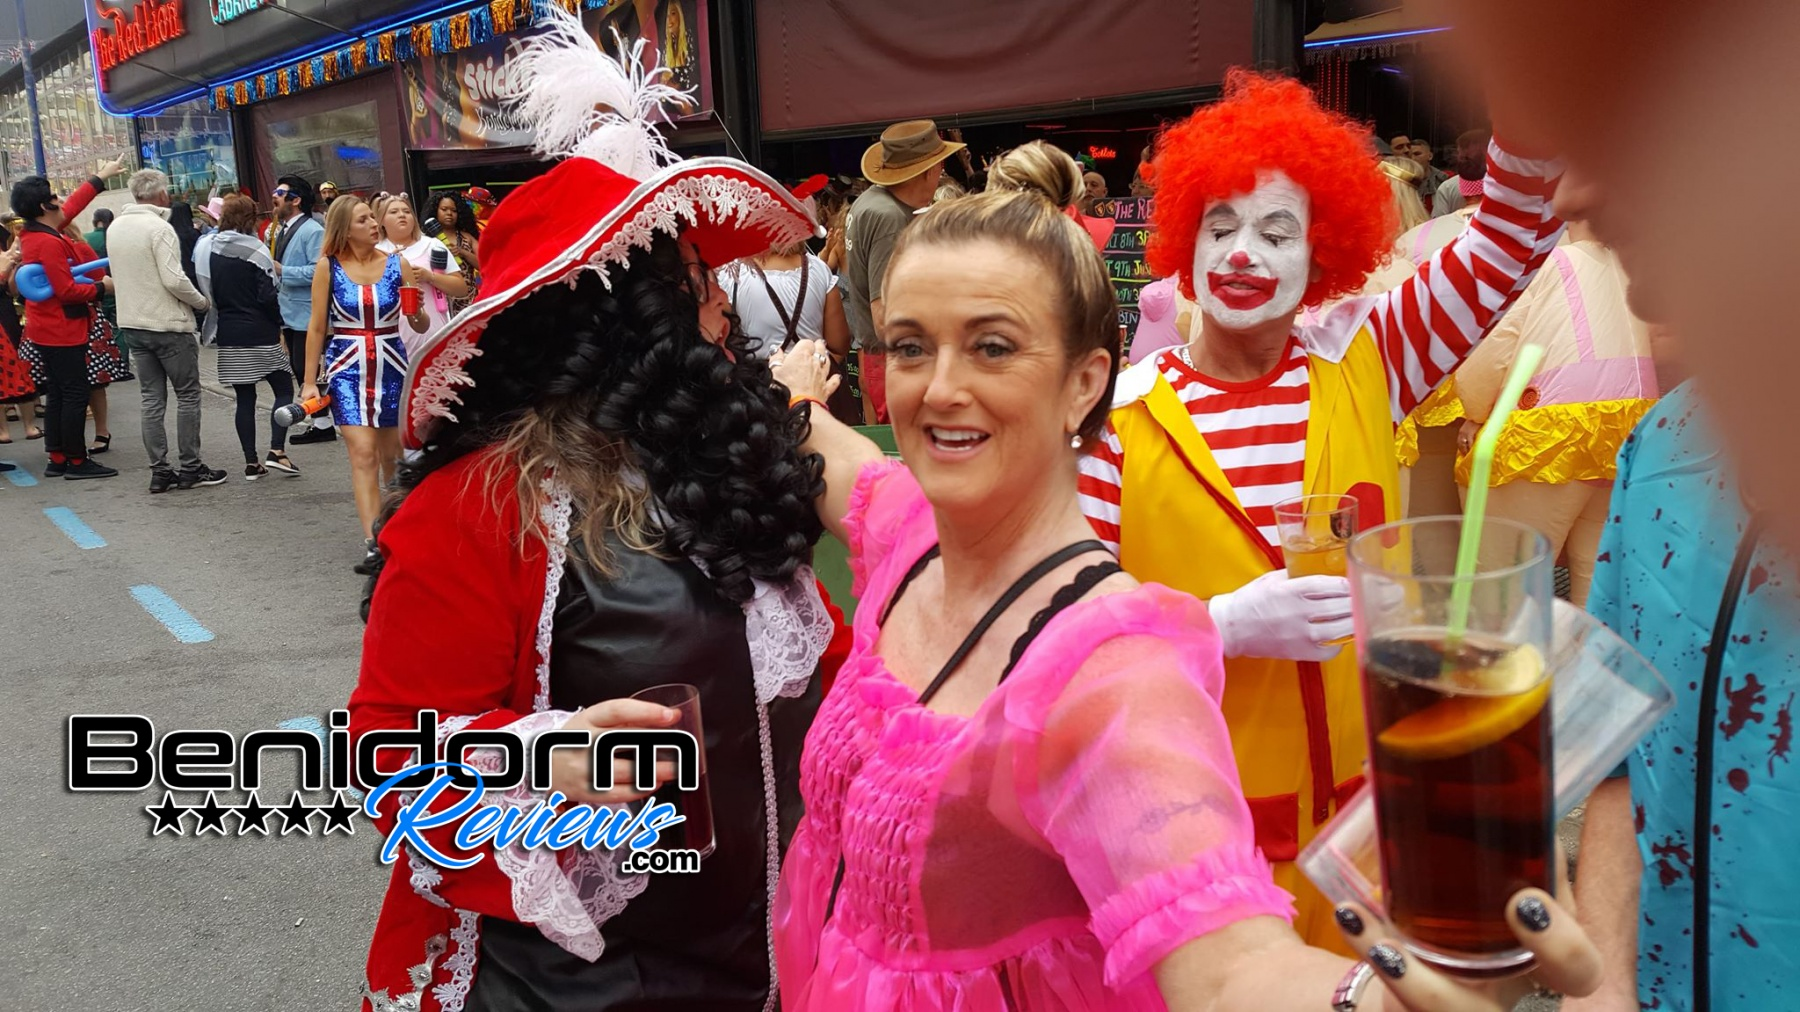 Benidorm-Fiestas-2019-Fancy-Dress-207